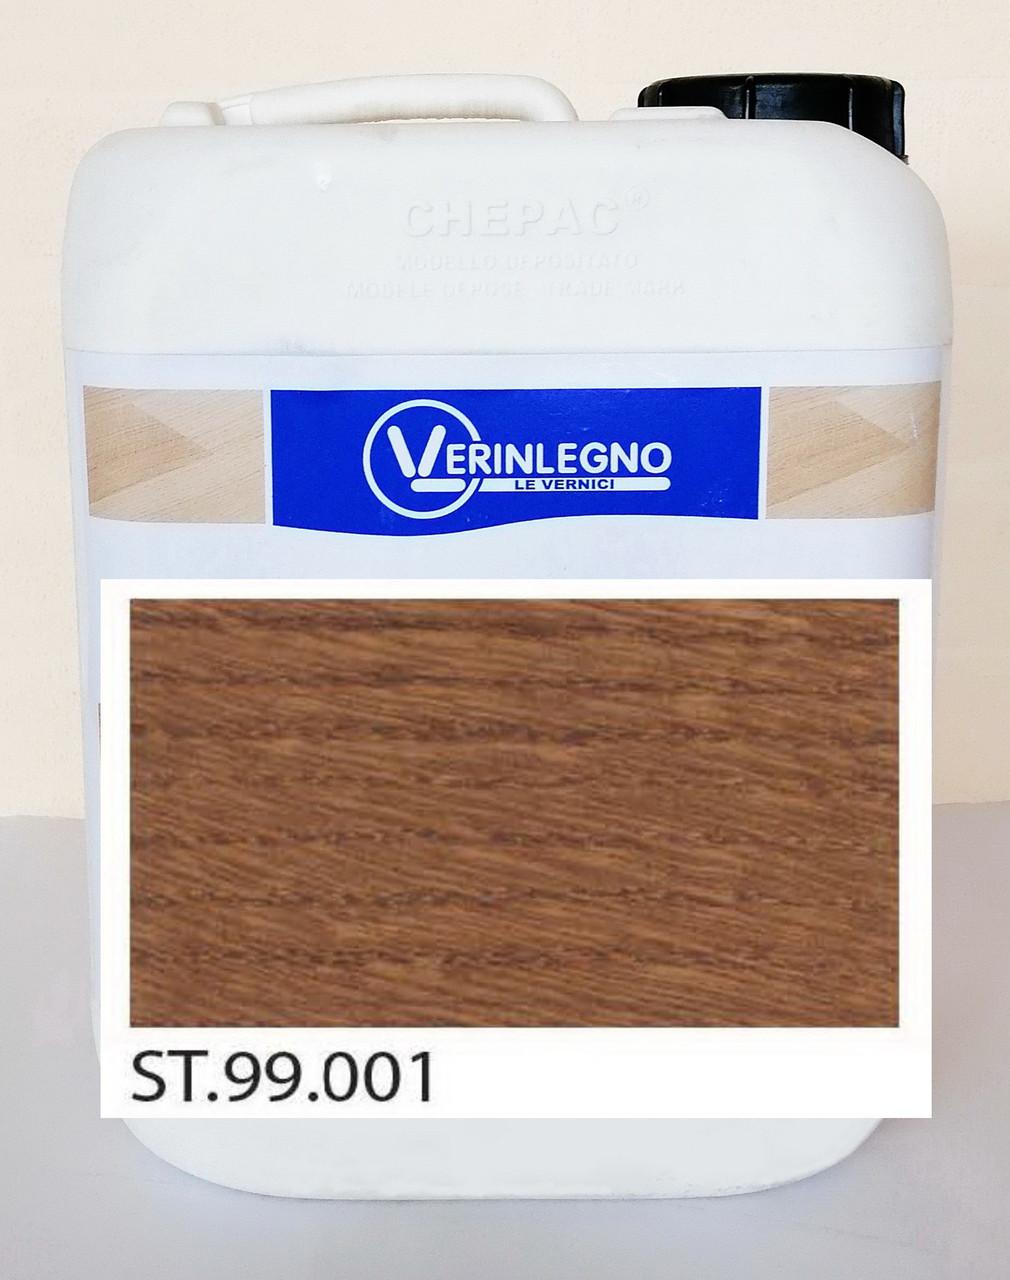 Краситель (морилка, пропитка, бейц)  для дерева VERINLEGNO ST.99.001, тара: 1л.